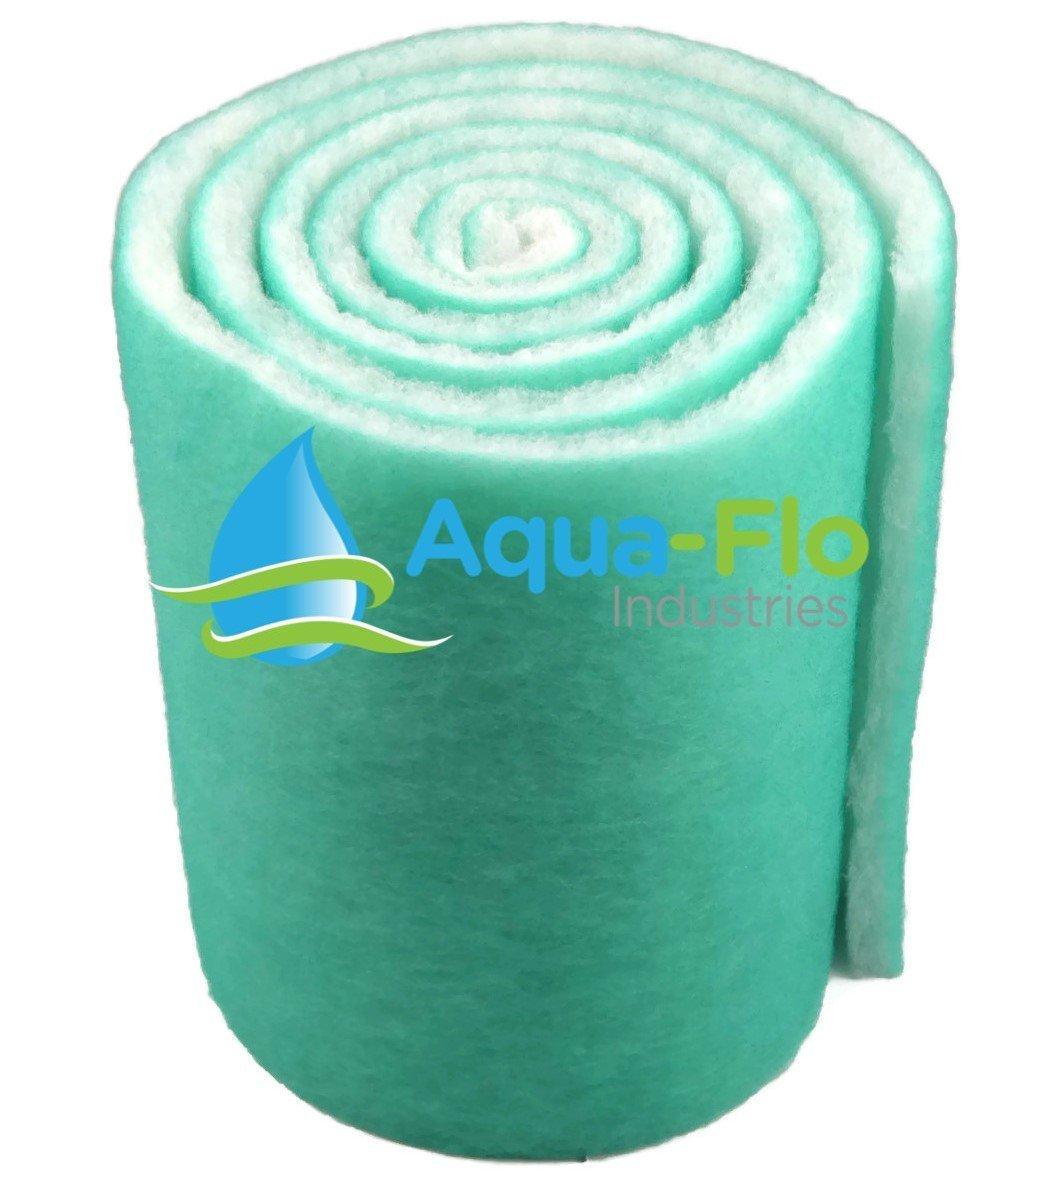 "Aqua-Flo 12"" Pond & Aquarium Filter Media, 72"" (6 Feet) Long x 1"" Thick (Green/White)"